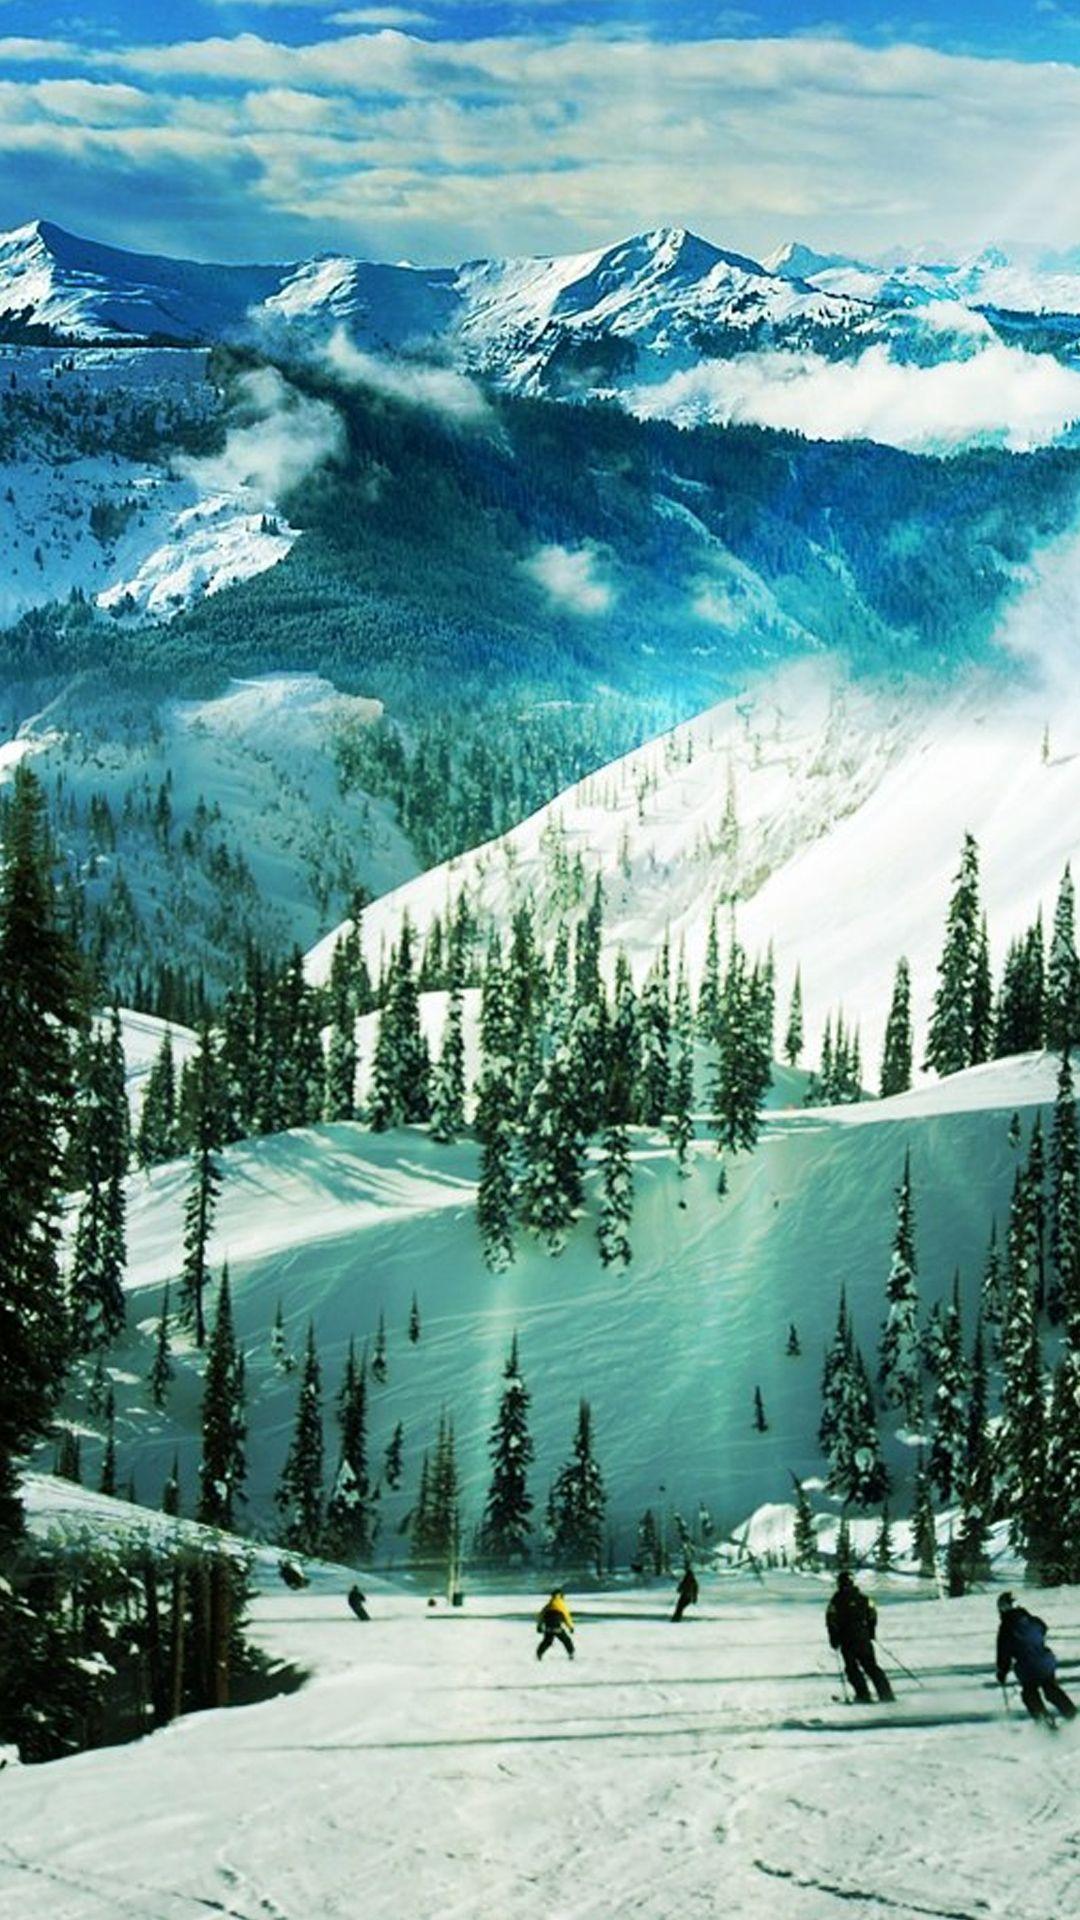 60 Beautiful Nature Wallpaper Free To Download Iphone Wallpaper Landscape Winter Landscape Beautiful Nature Wallpaper